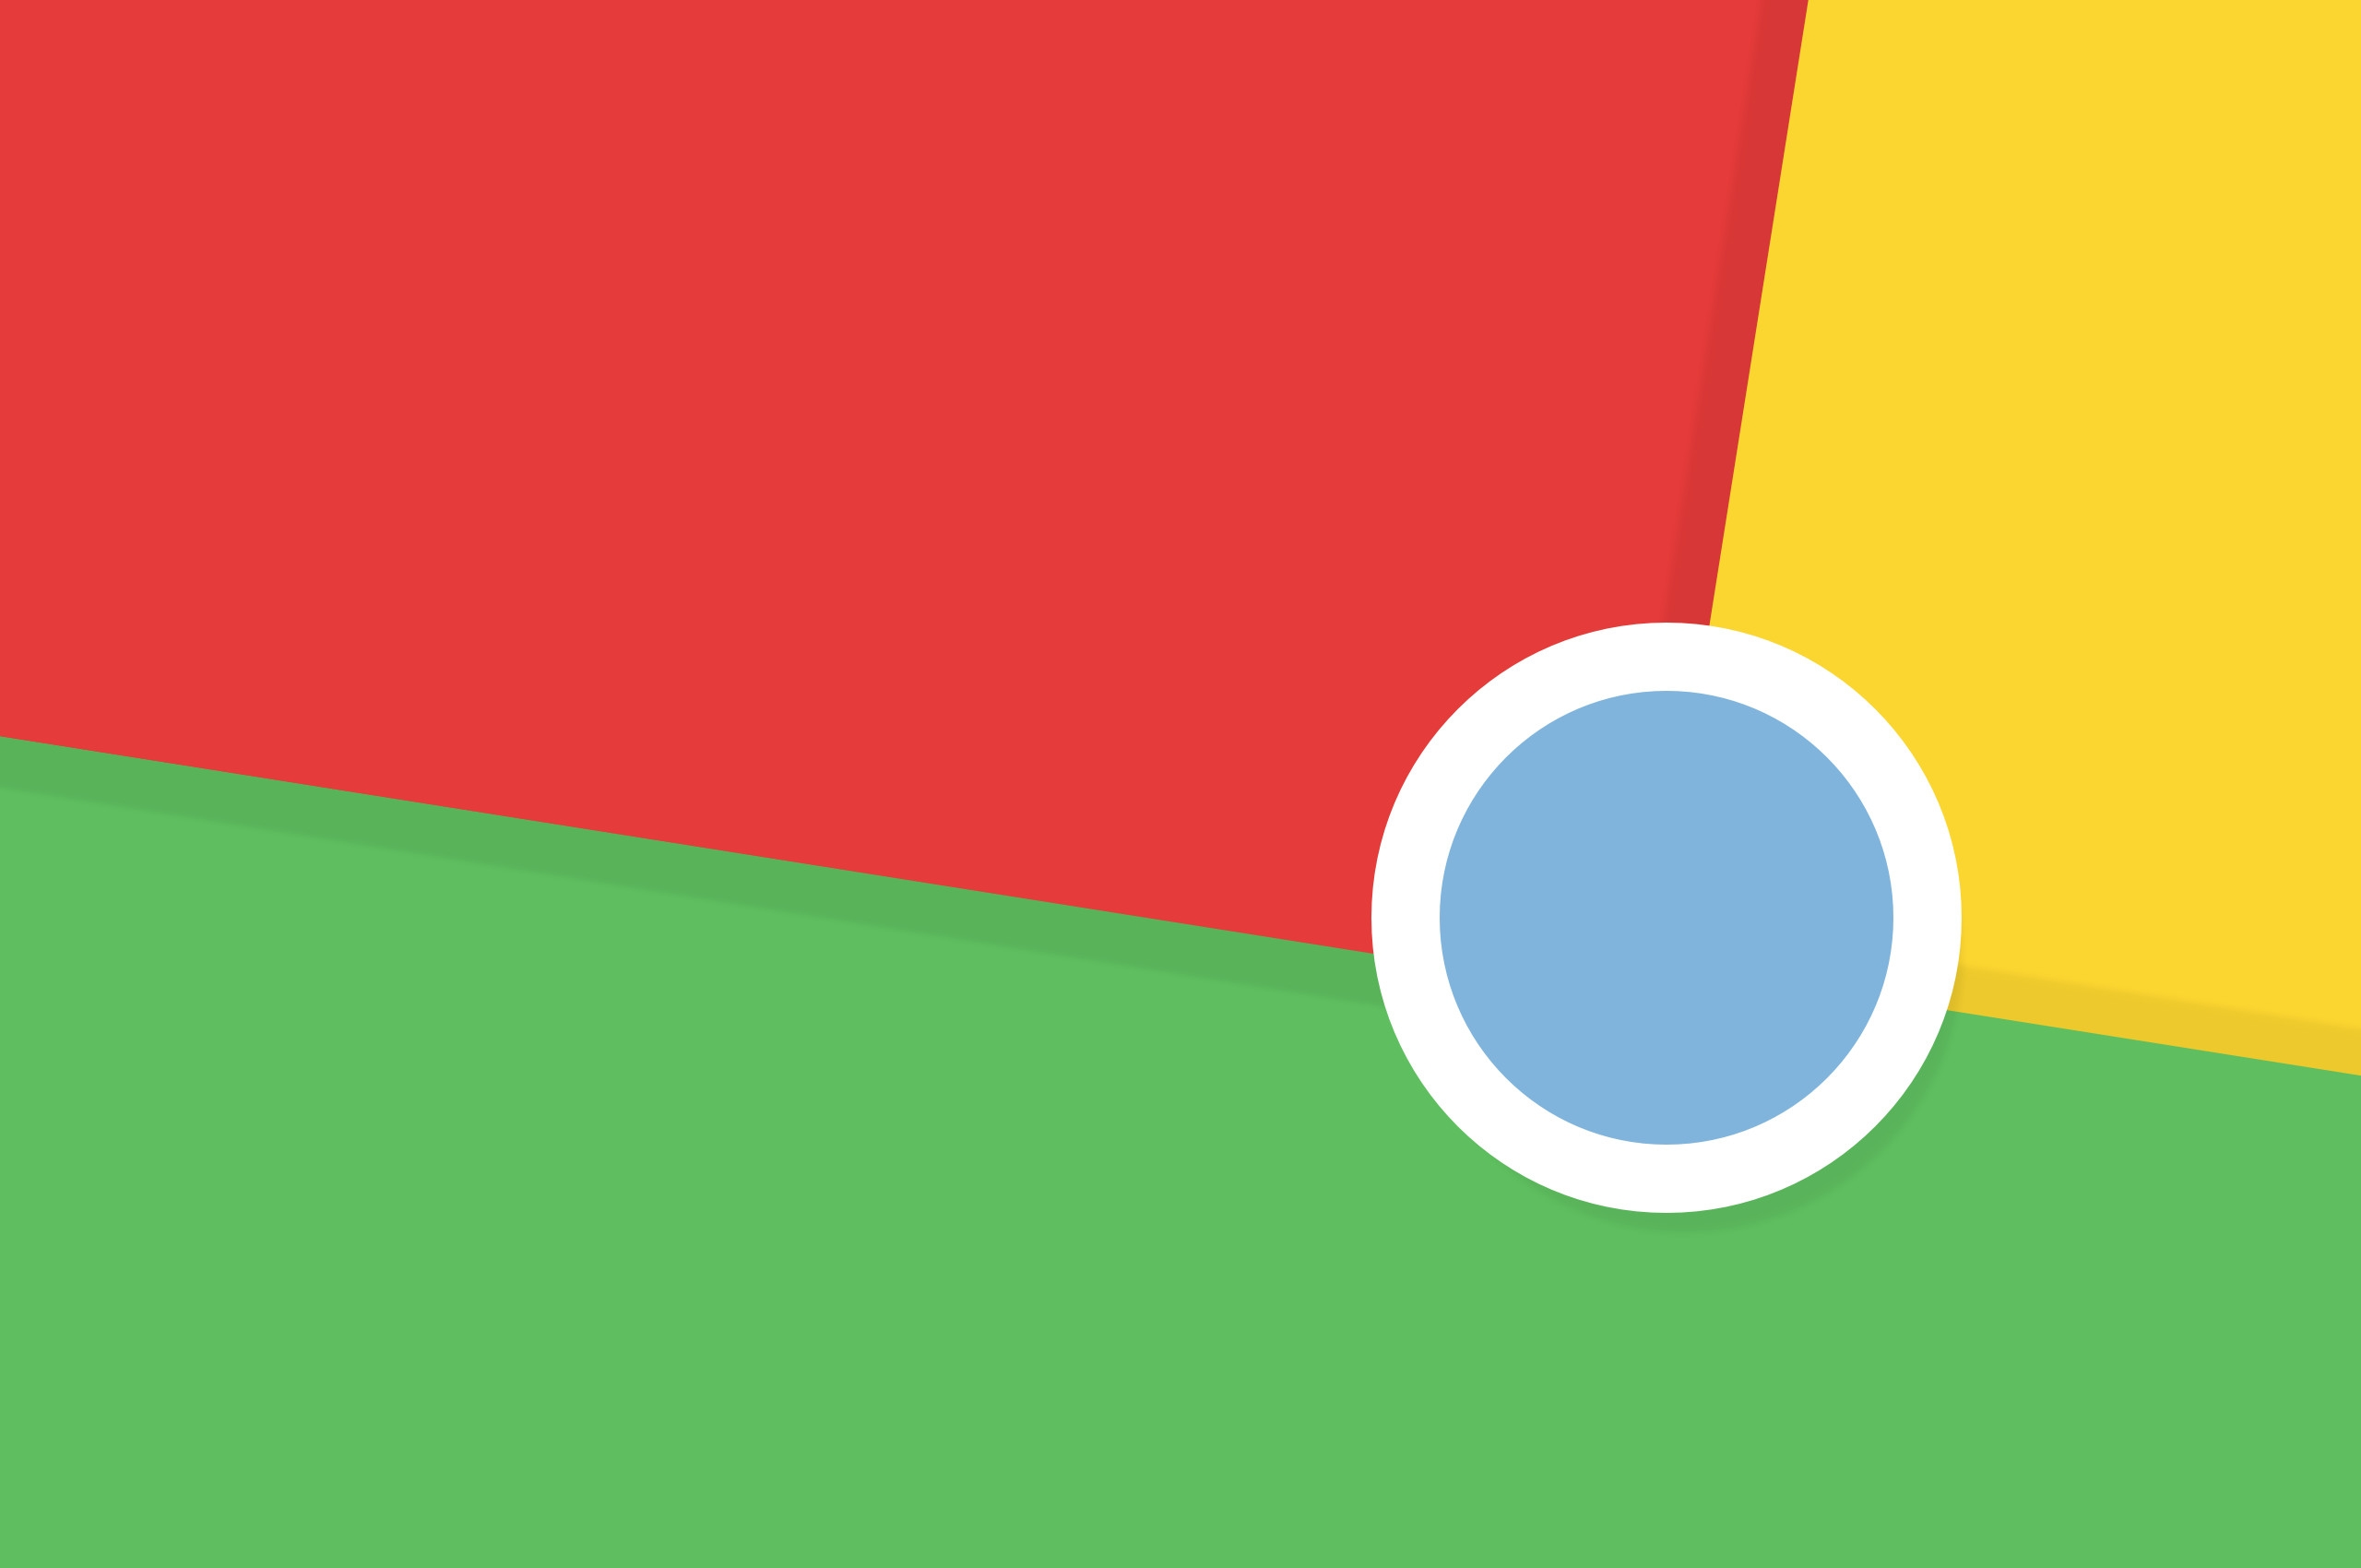 Google Chreome